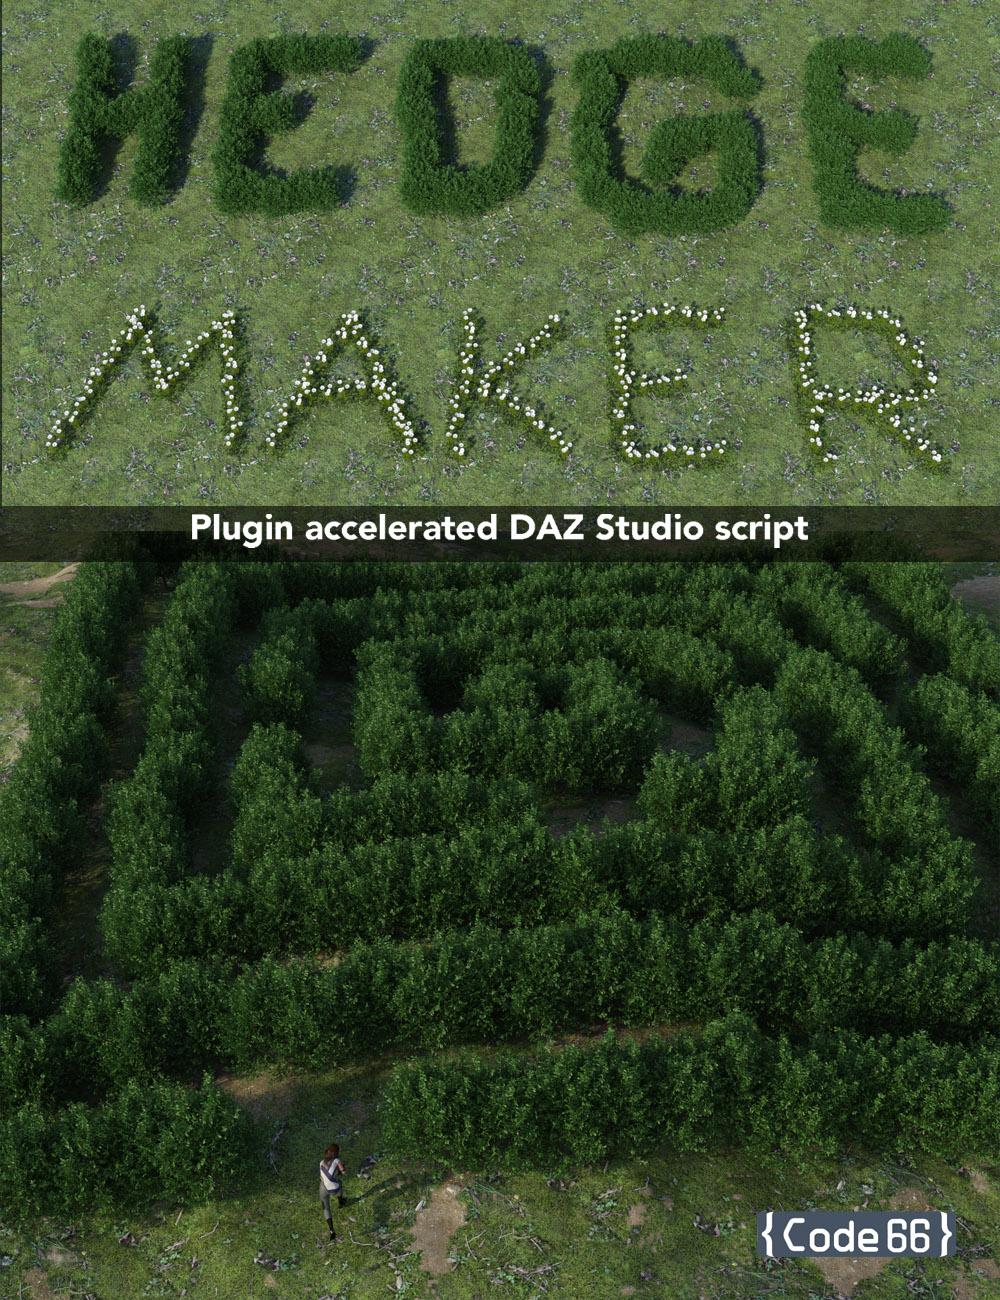 HedgeMaker by: Code 66, 3D Models by Daz 3D